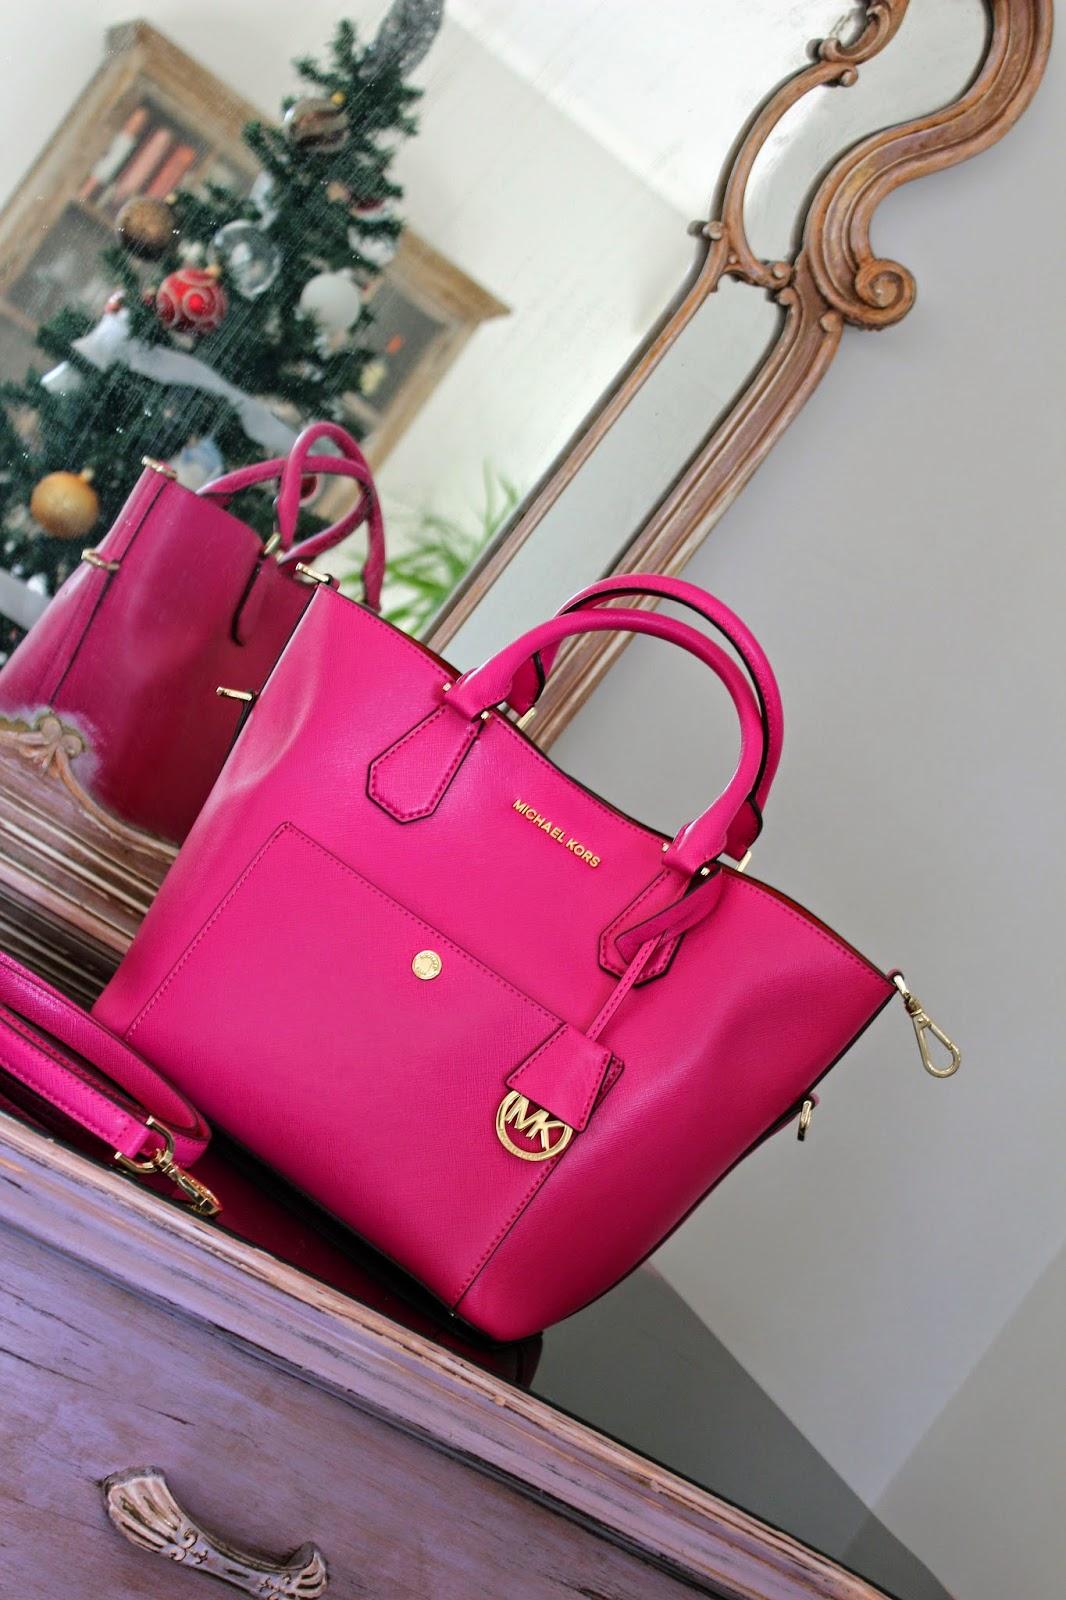 Eniwhere Fashion - Greenwich - Michael Kors - Bag - Must have